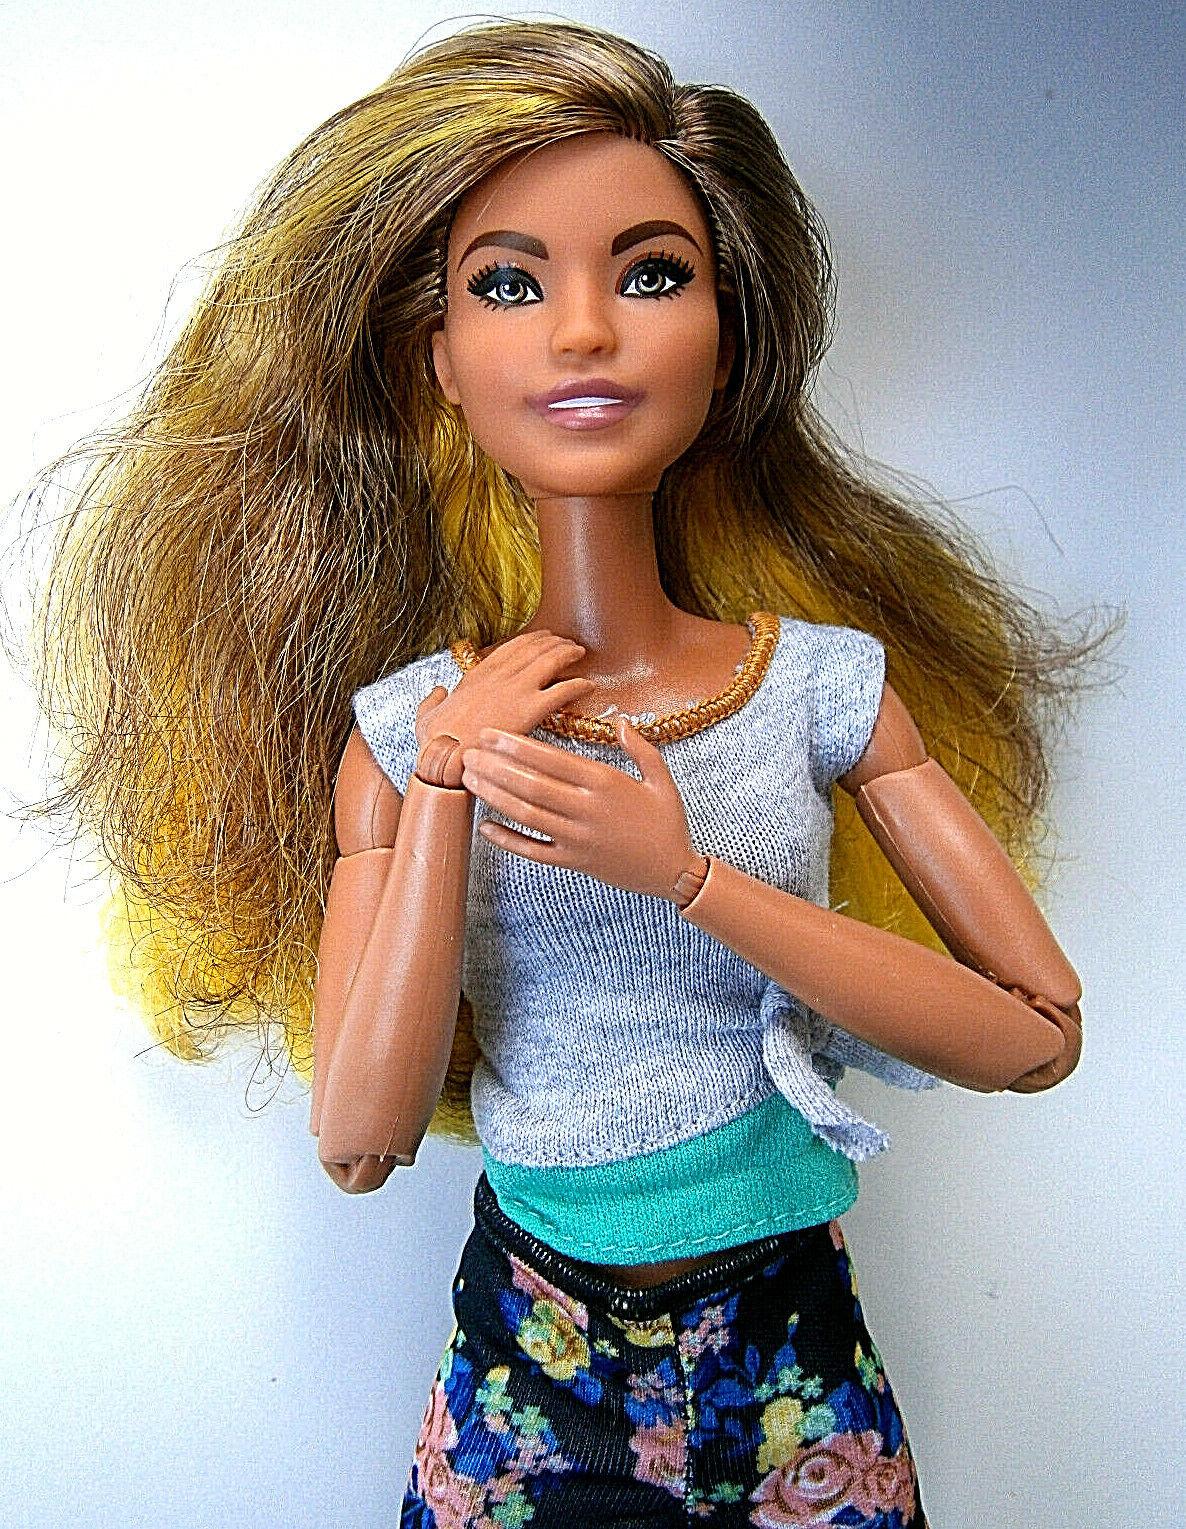 Barbie mattel made to move fashionistas nº Hybrid Doll a. konvult colección